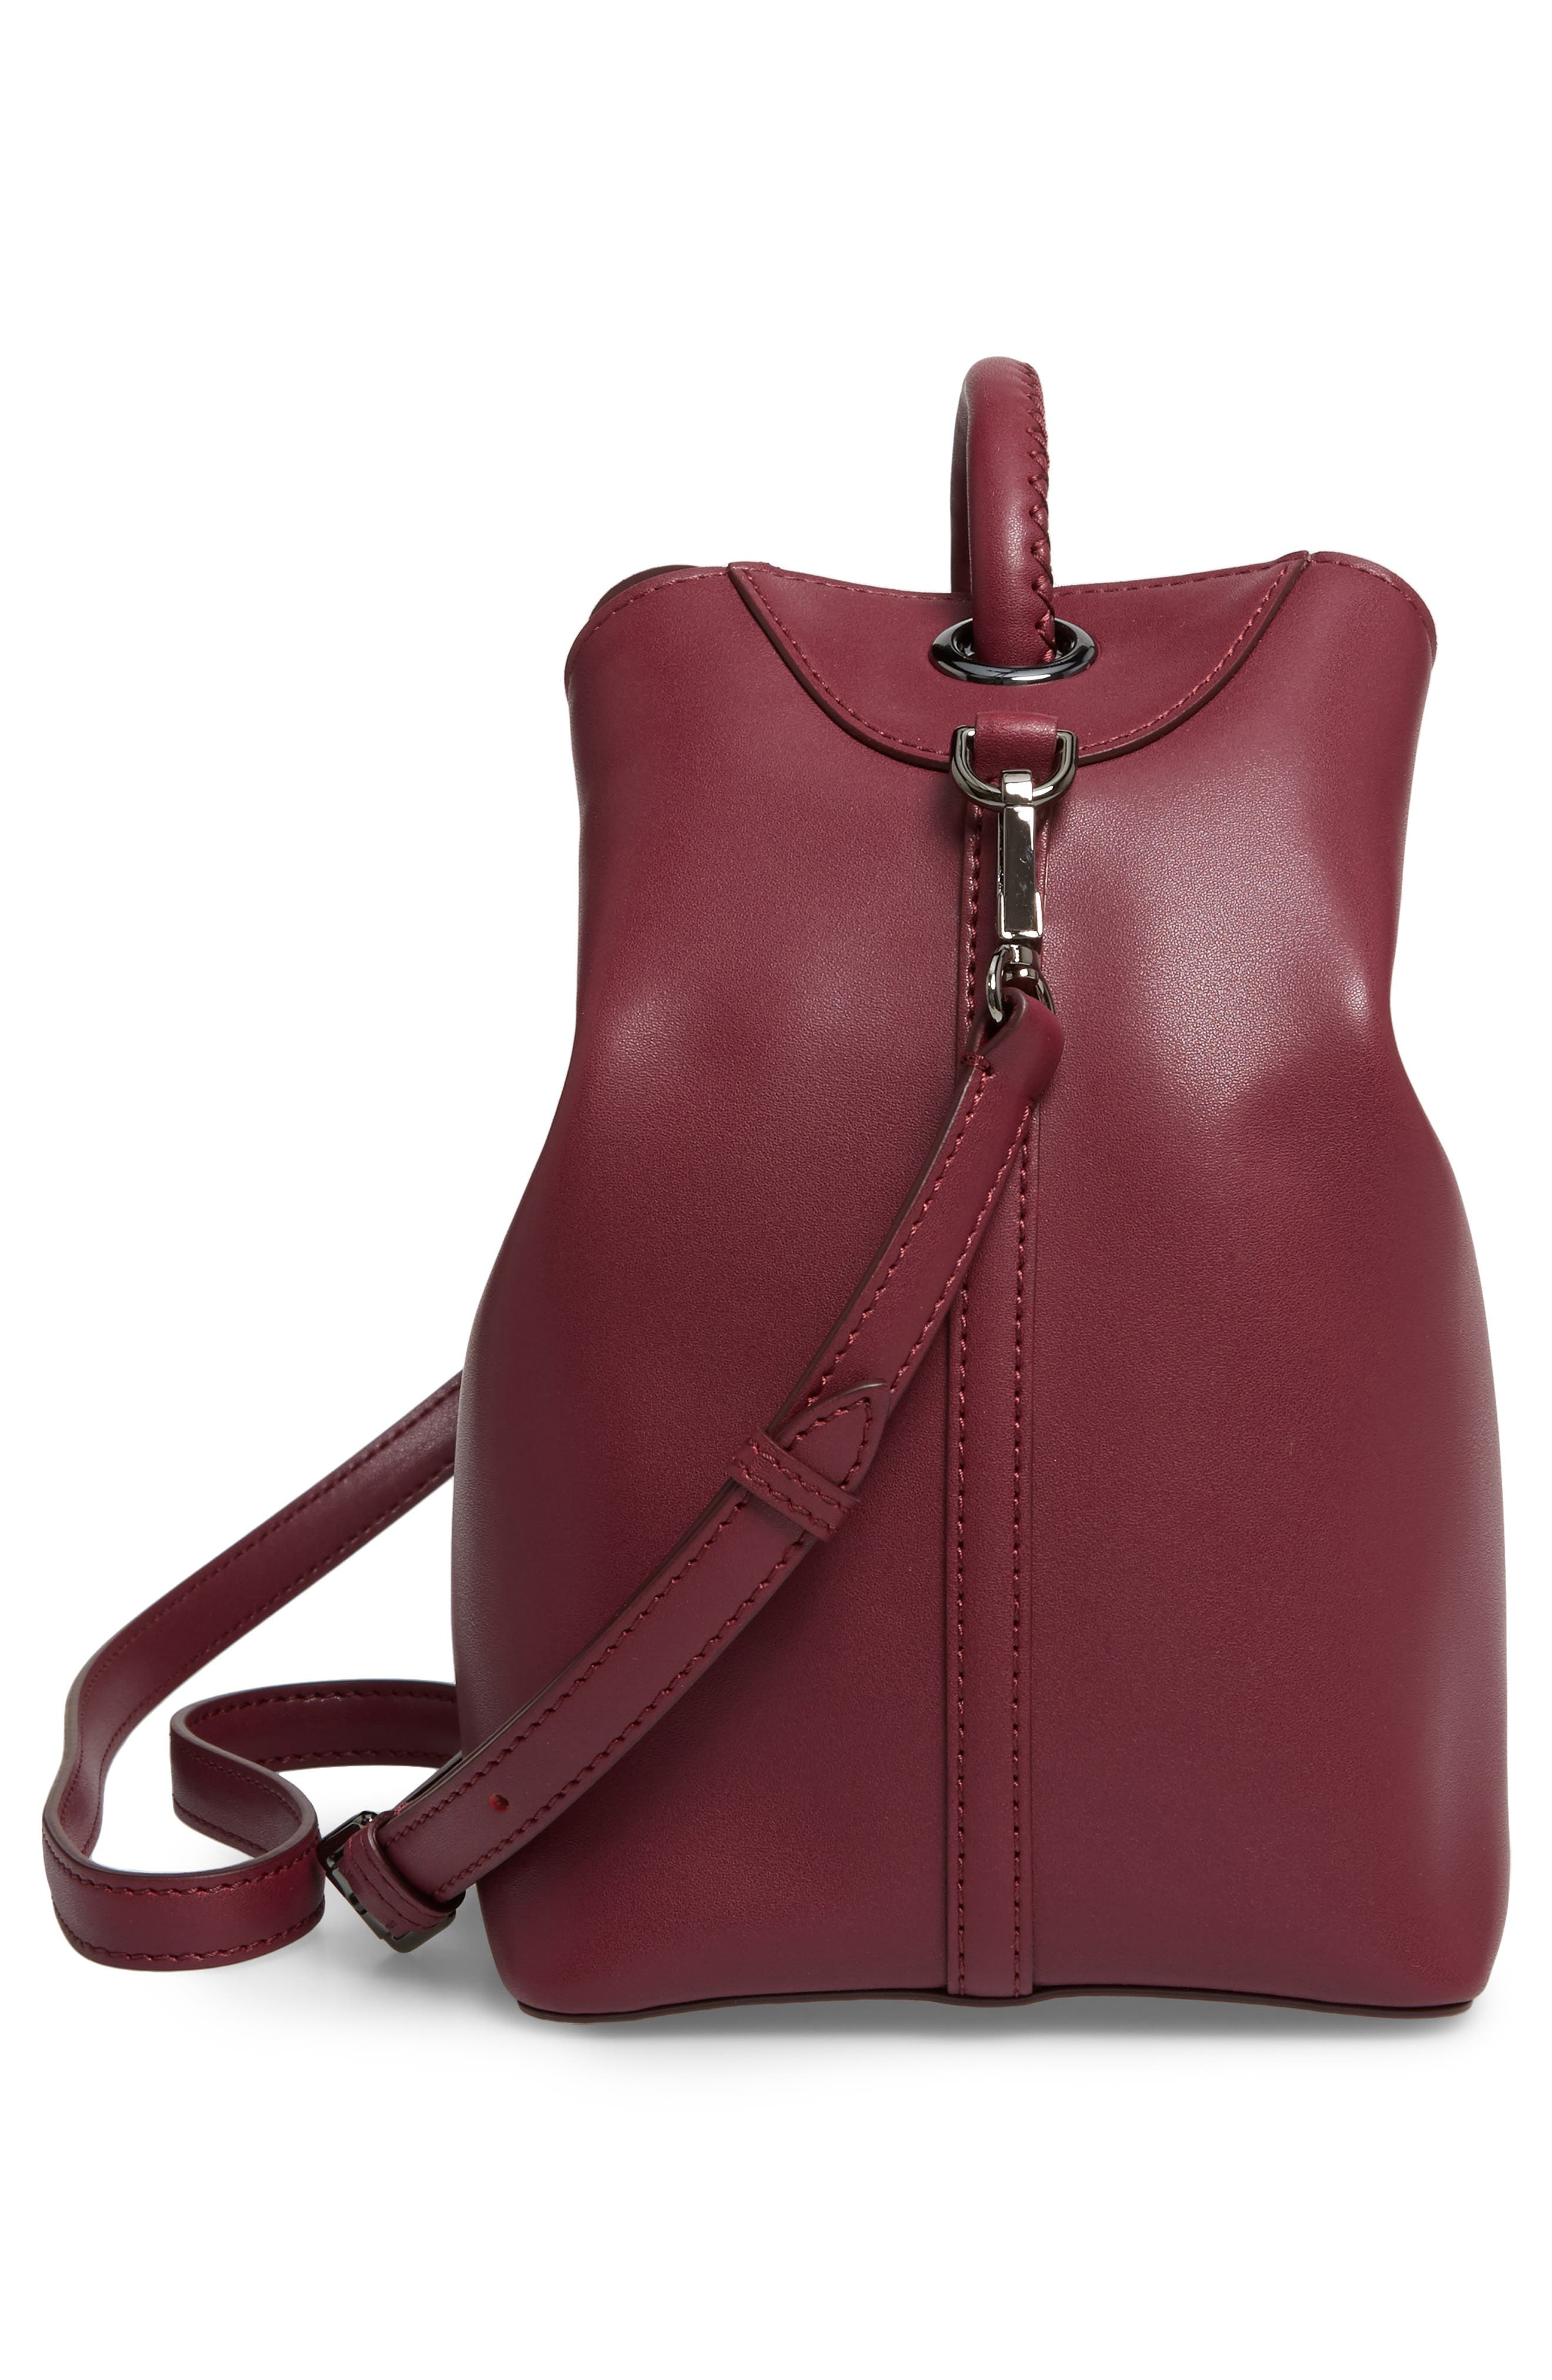 Raisin Leather Handbag,                             Alternate thumbnail 40, color,